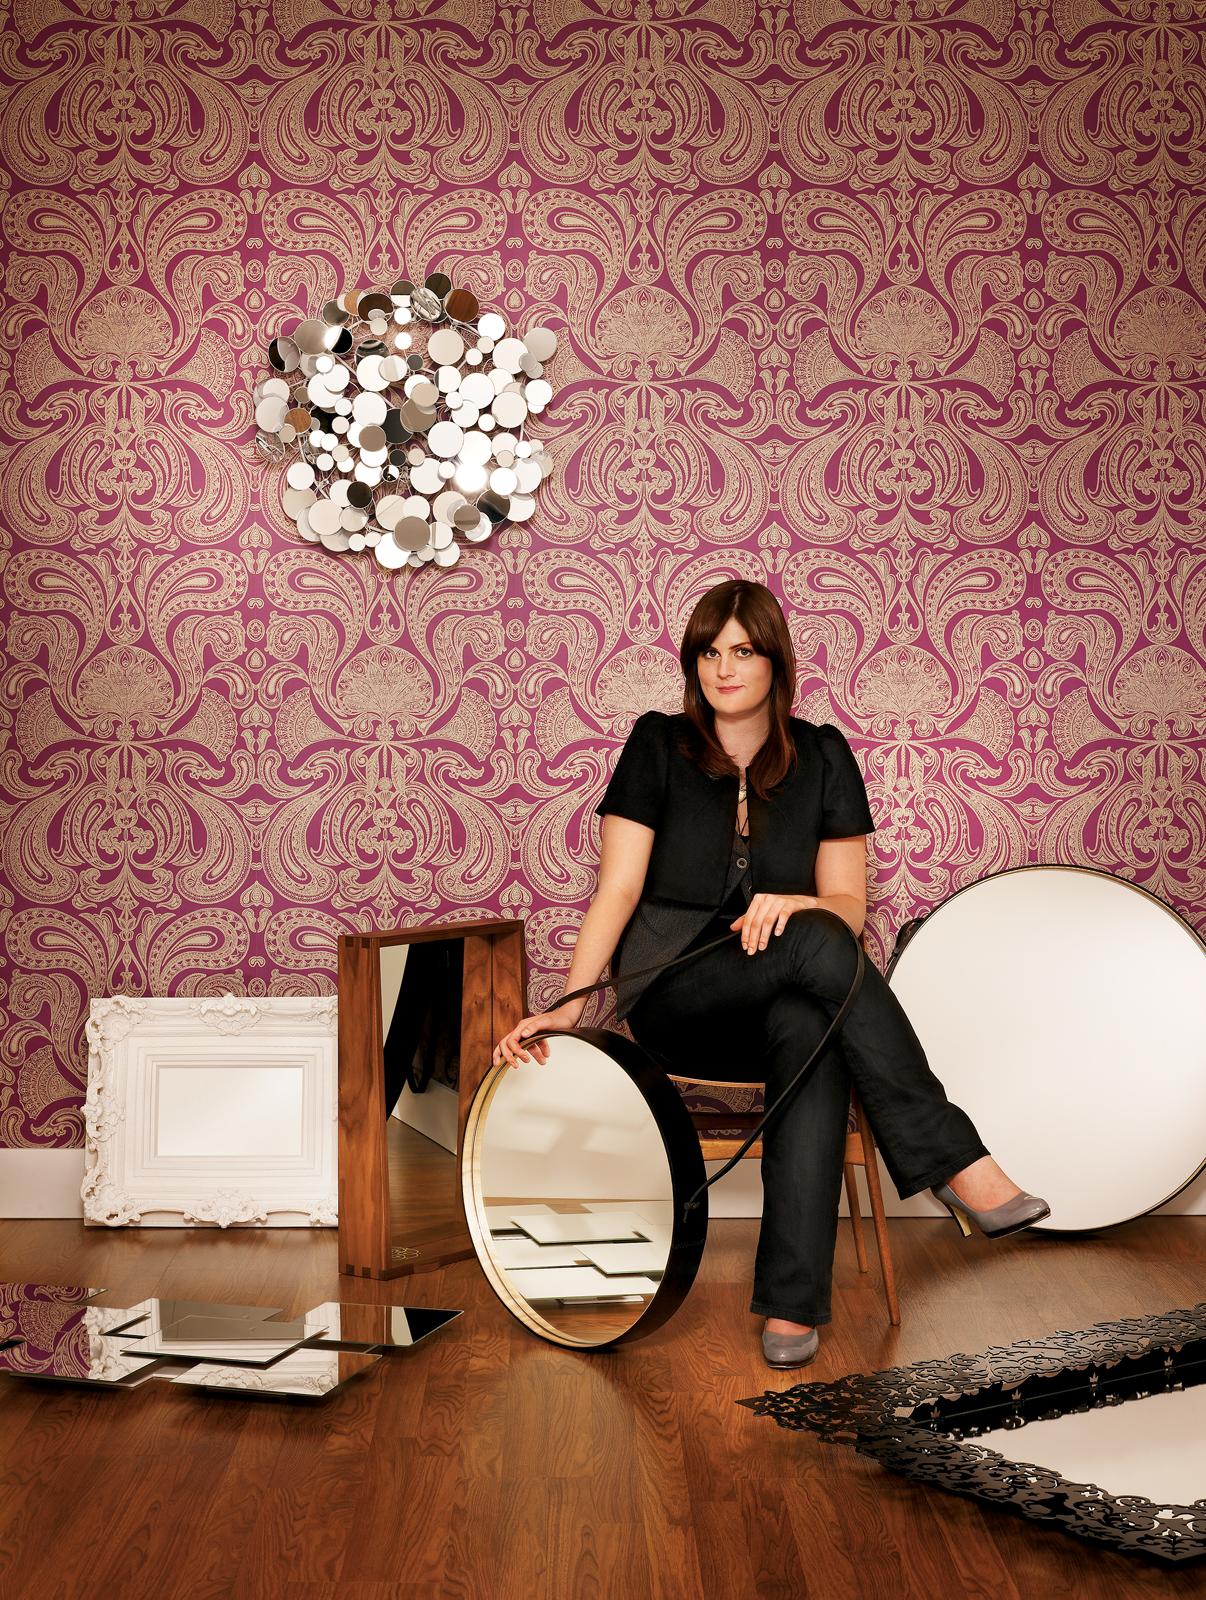 Interior designer Sally Kuchar